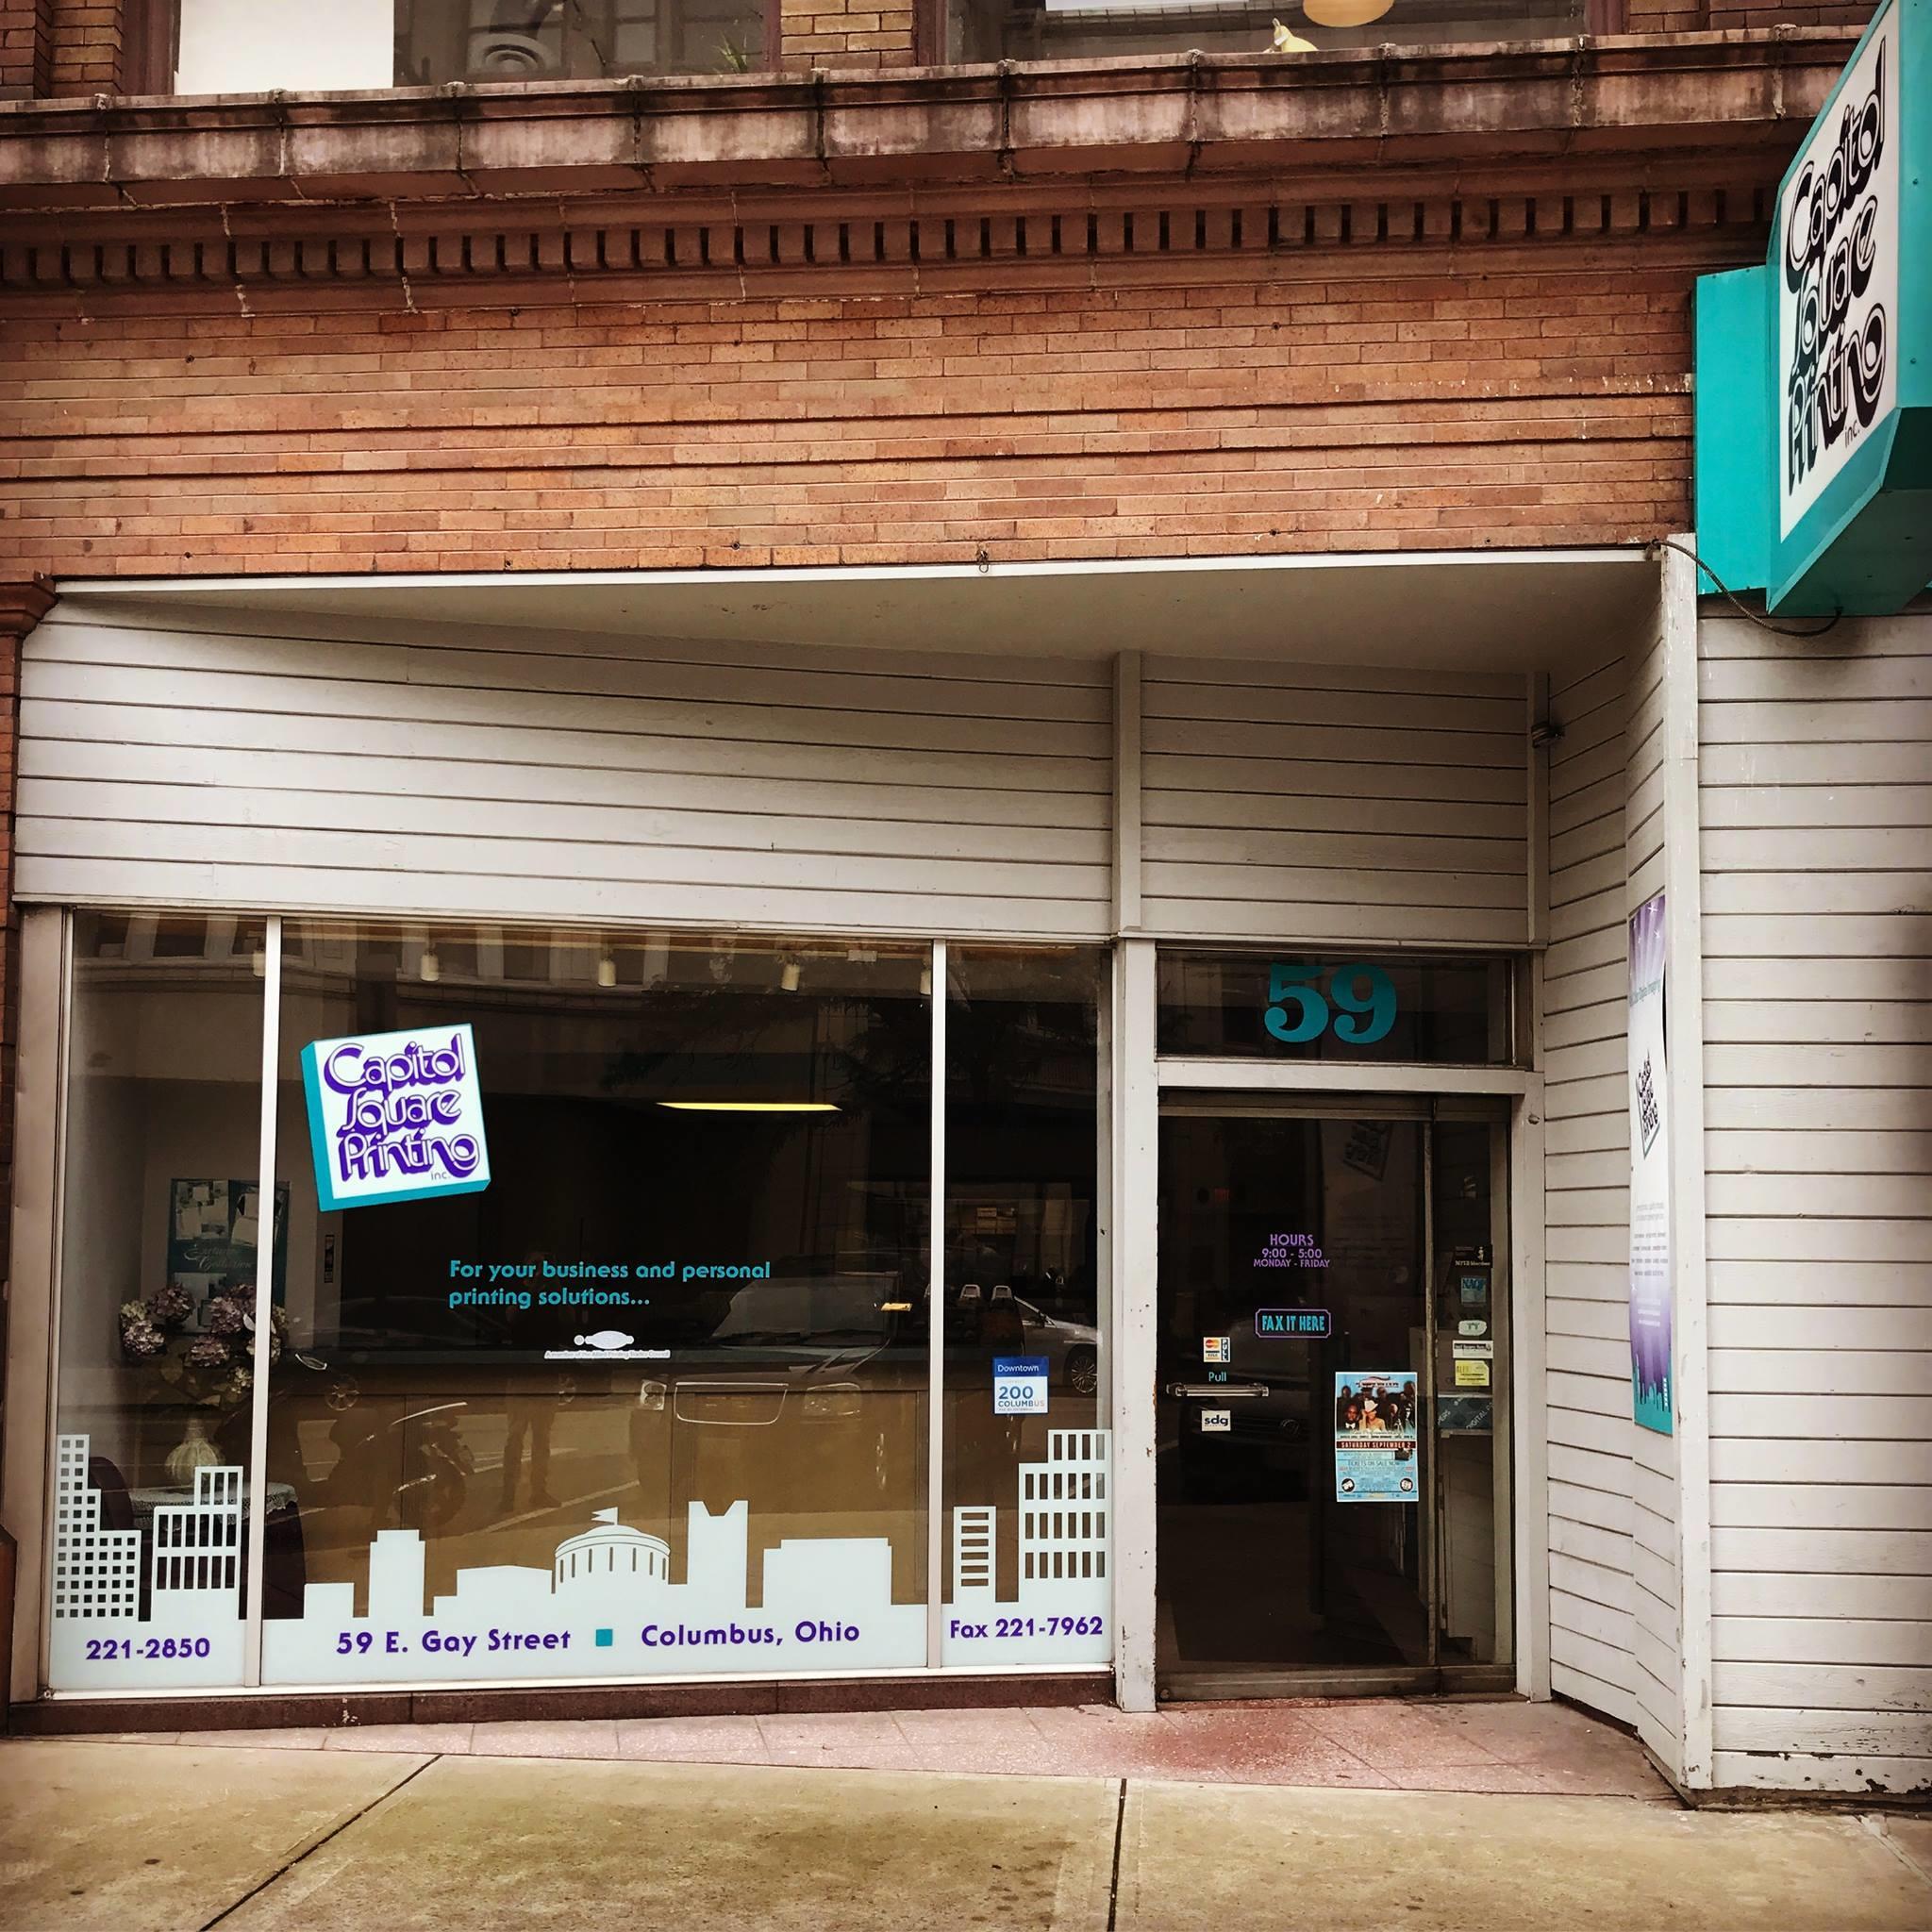 Capitol Square Printing Inc 59 E Gay St Columbus OH mercial